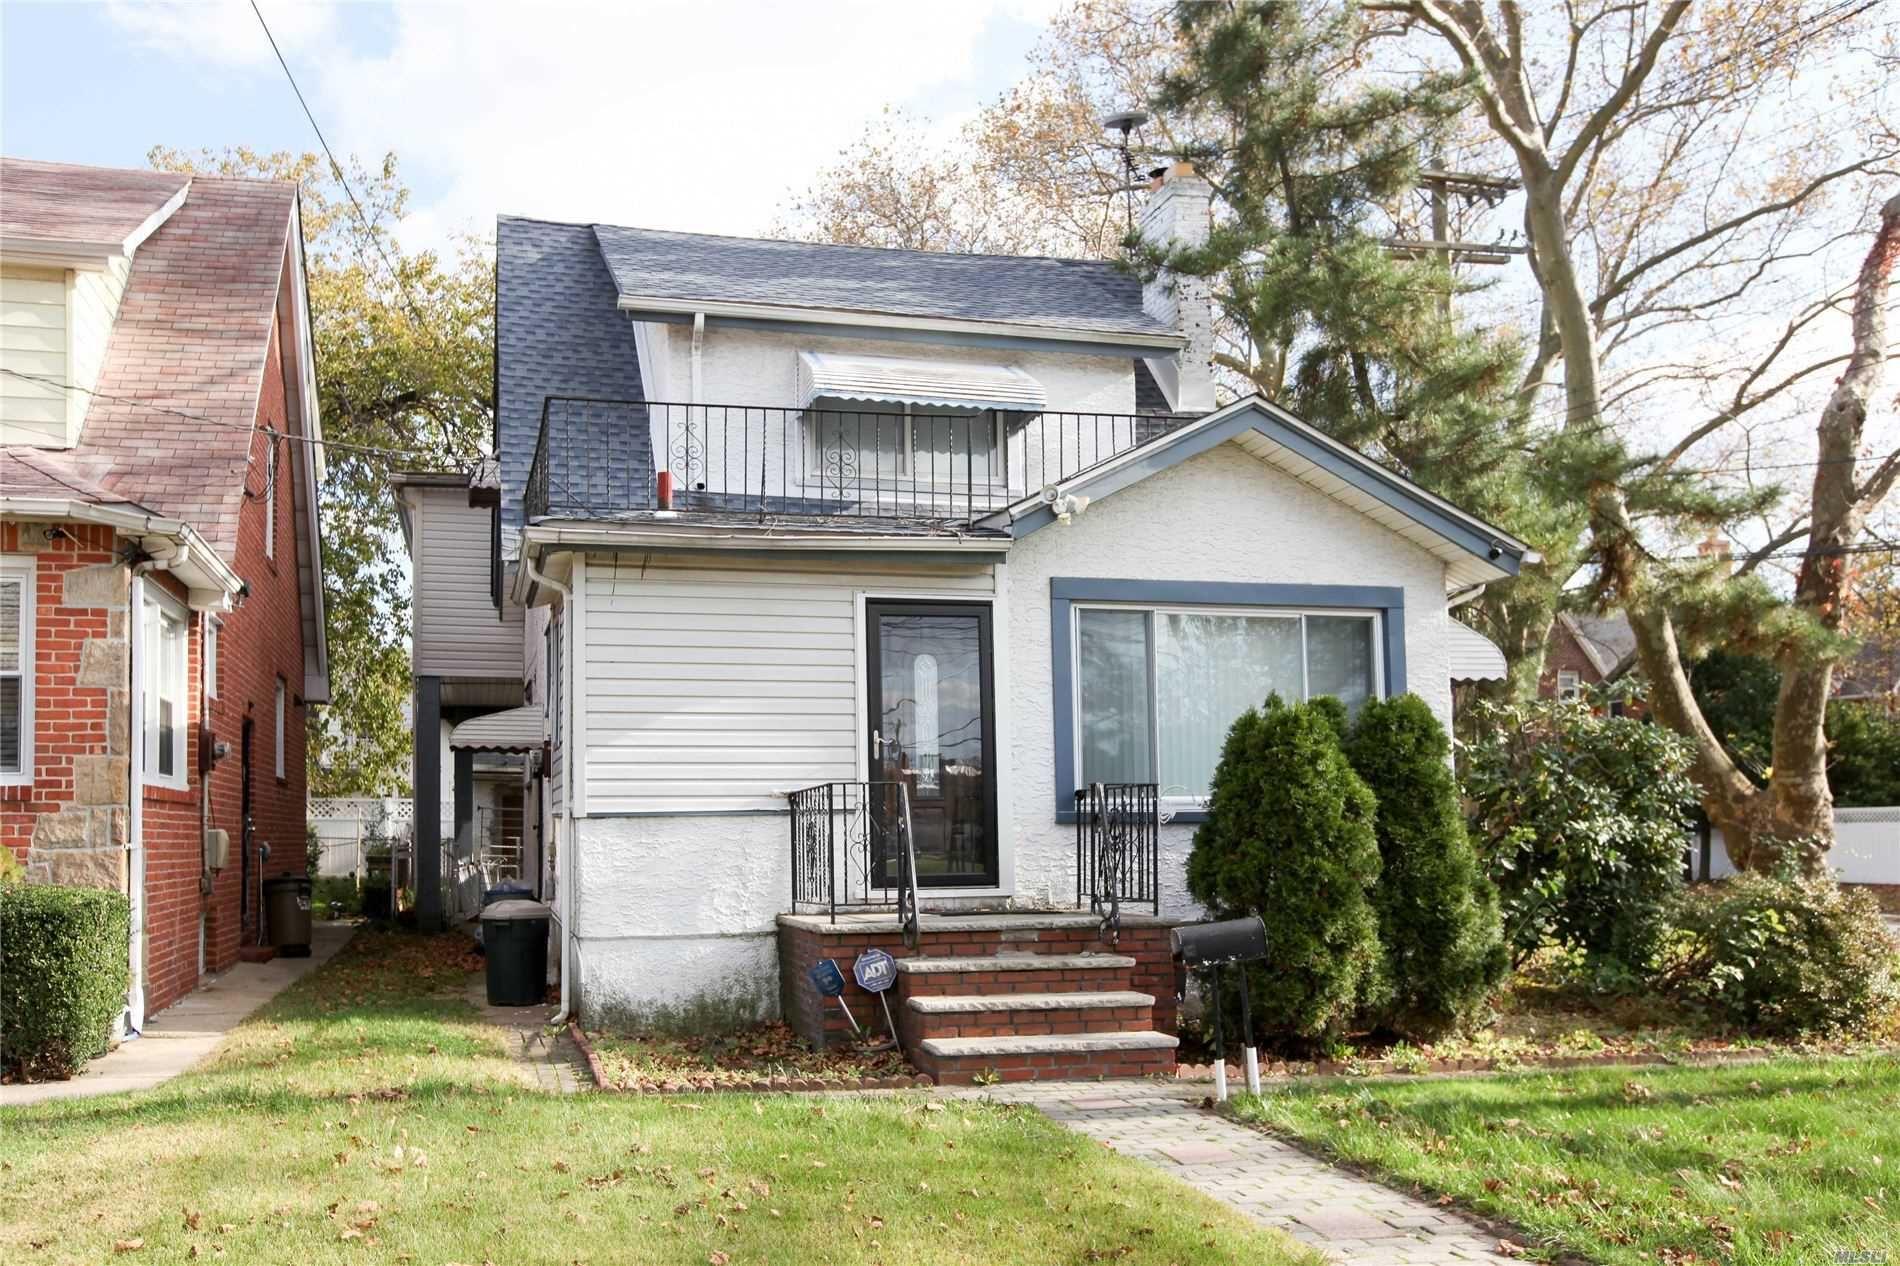 185-02 Hilburn Avenue, St. Albans, NY 11412 - MLS#: 3200483